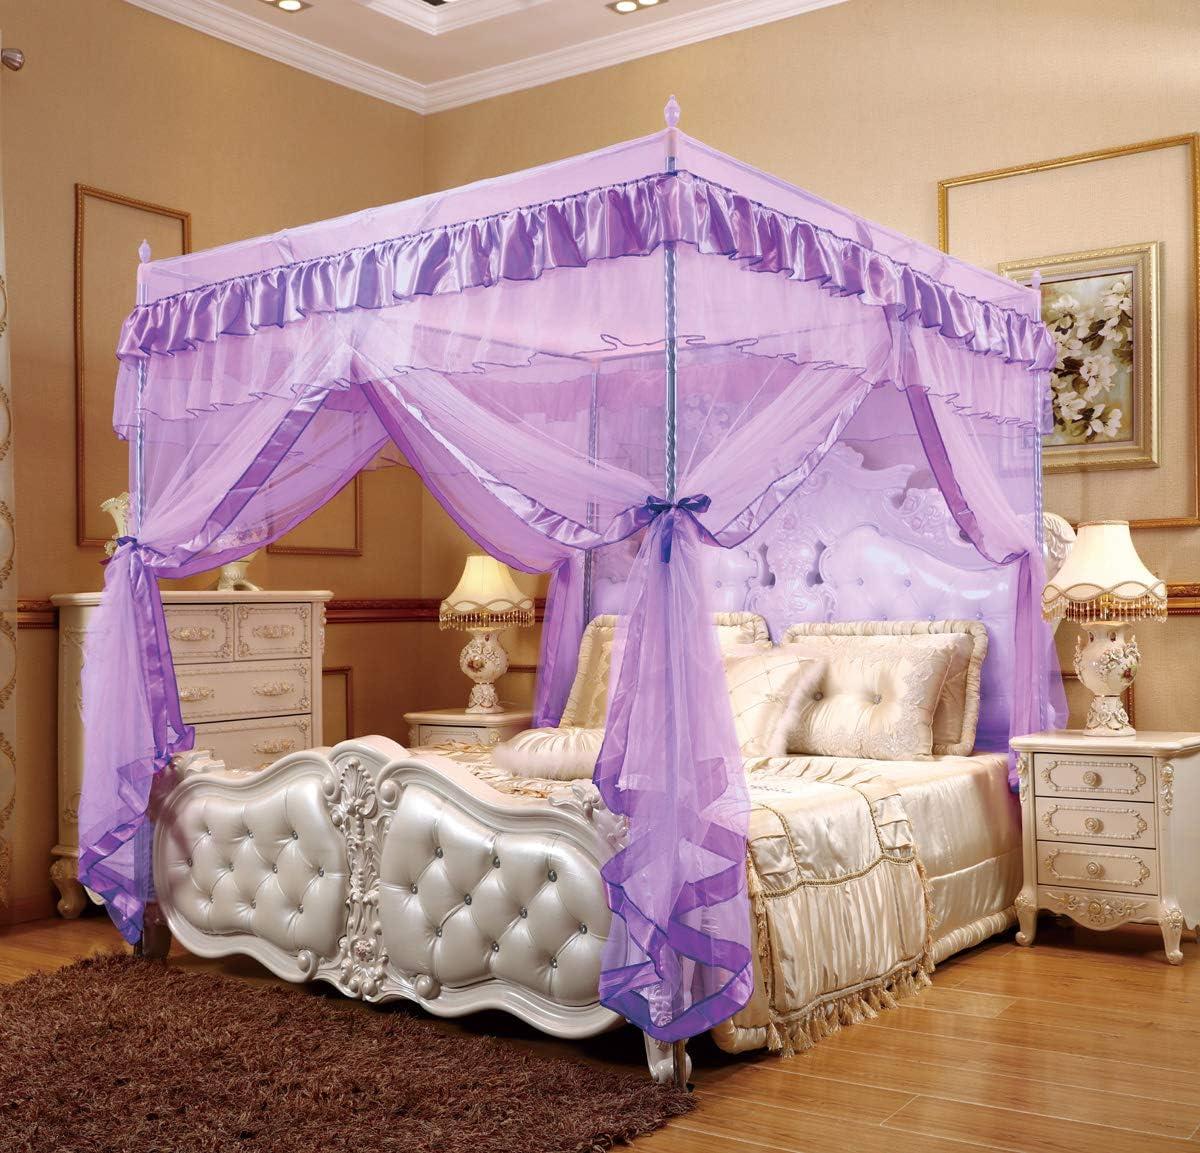 Nattey 4 Corners Princess Bed Curtain Canopy Net Canopies (Twin, Purple)